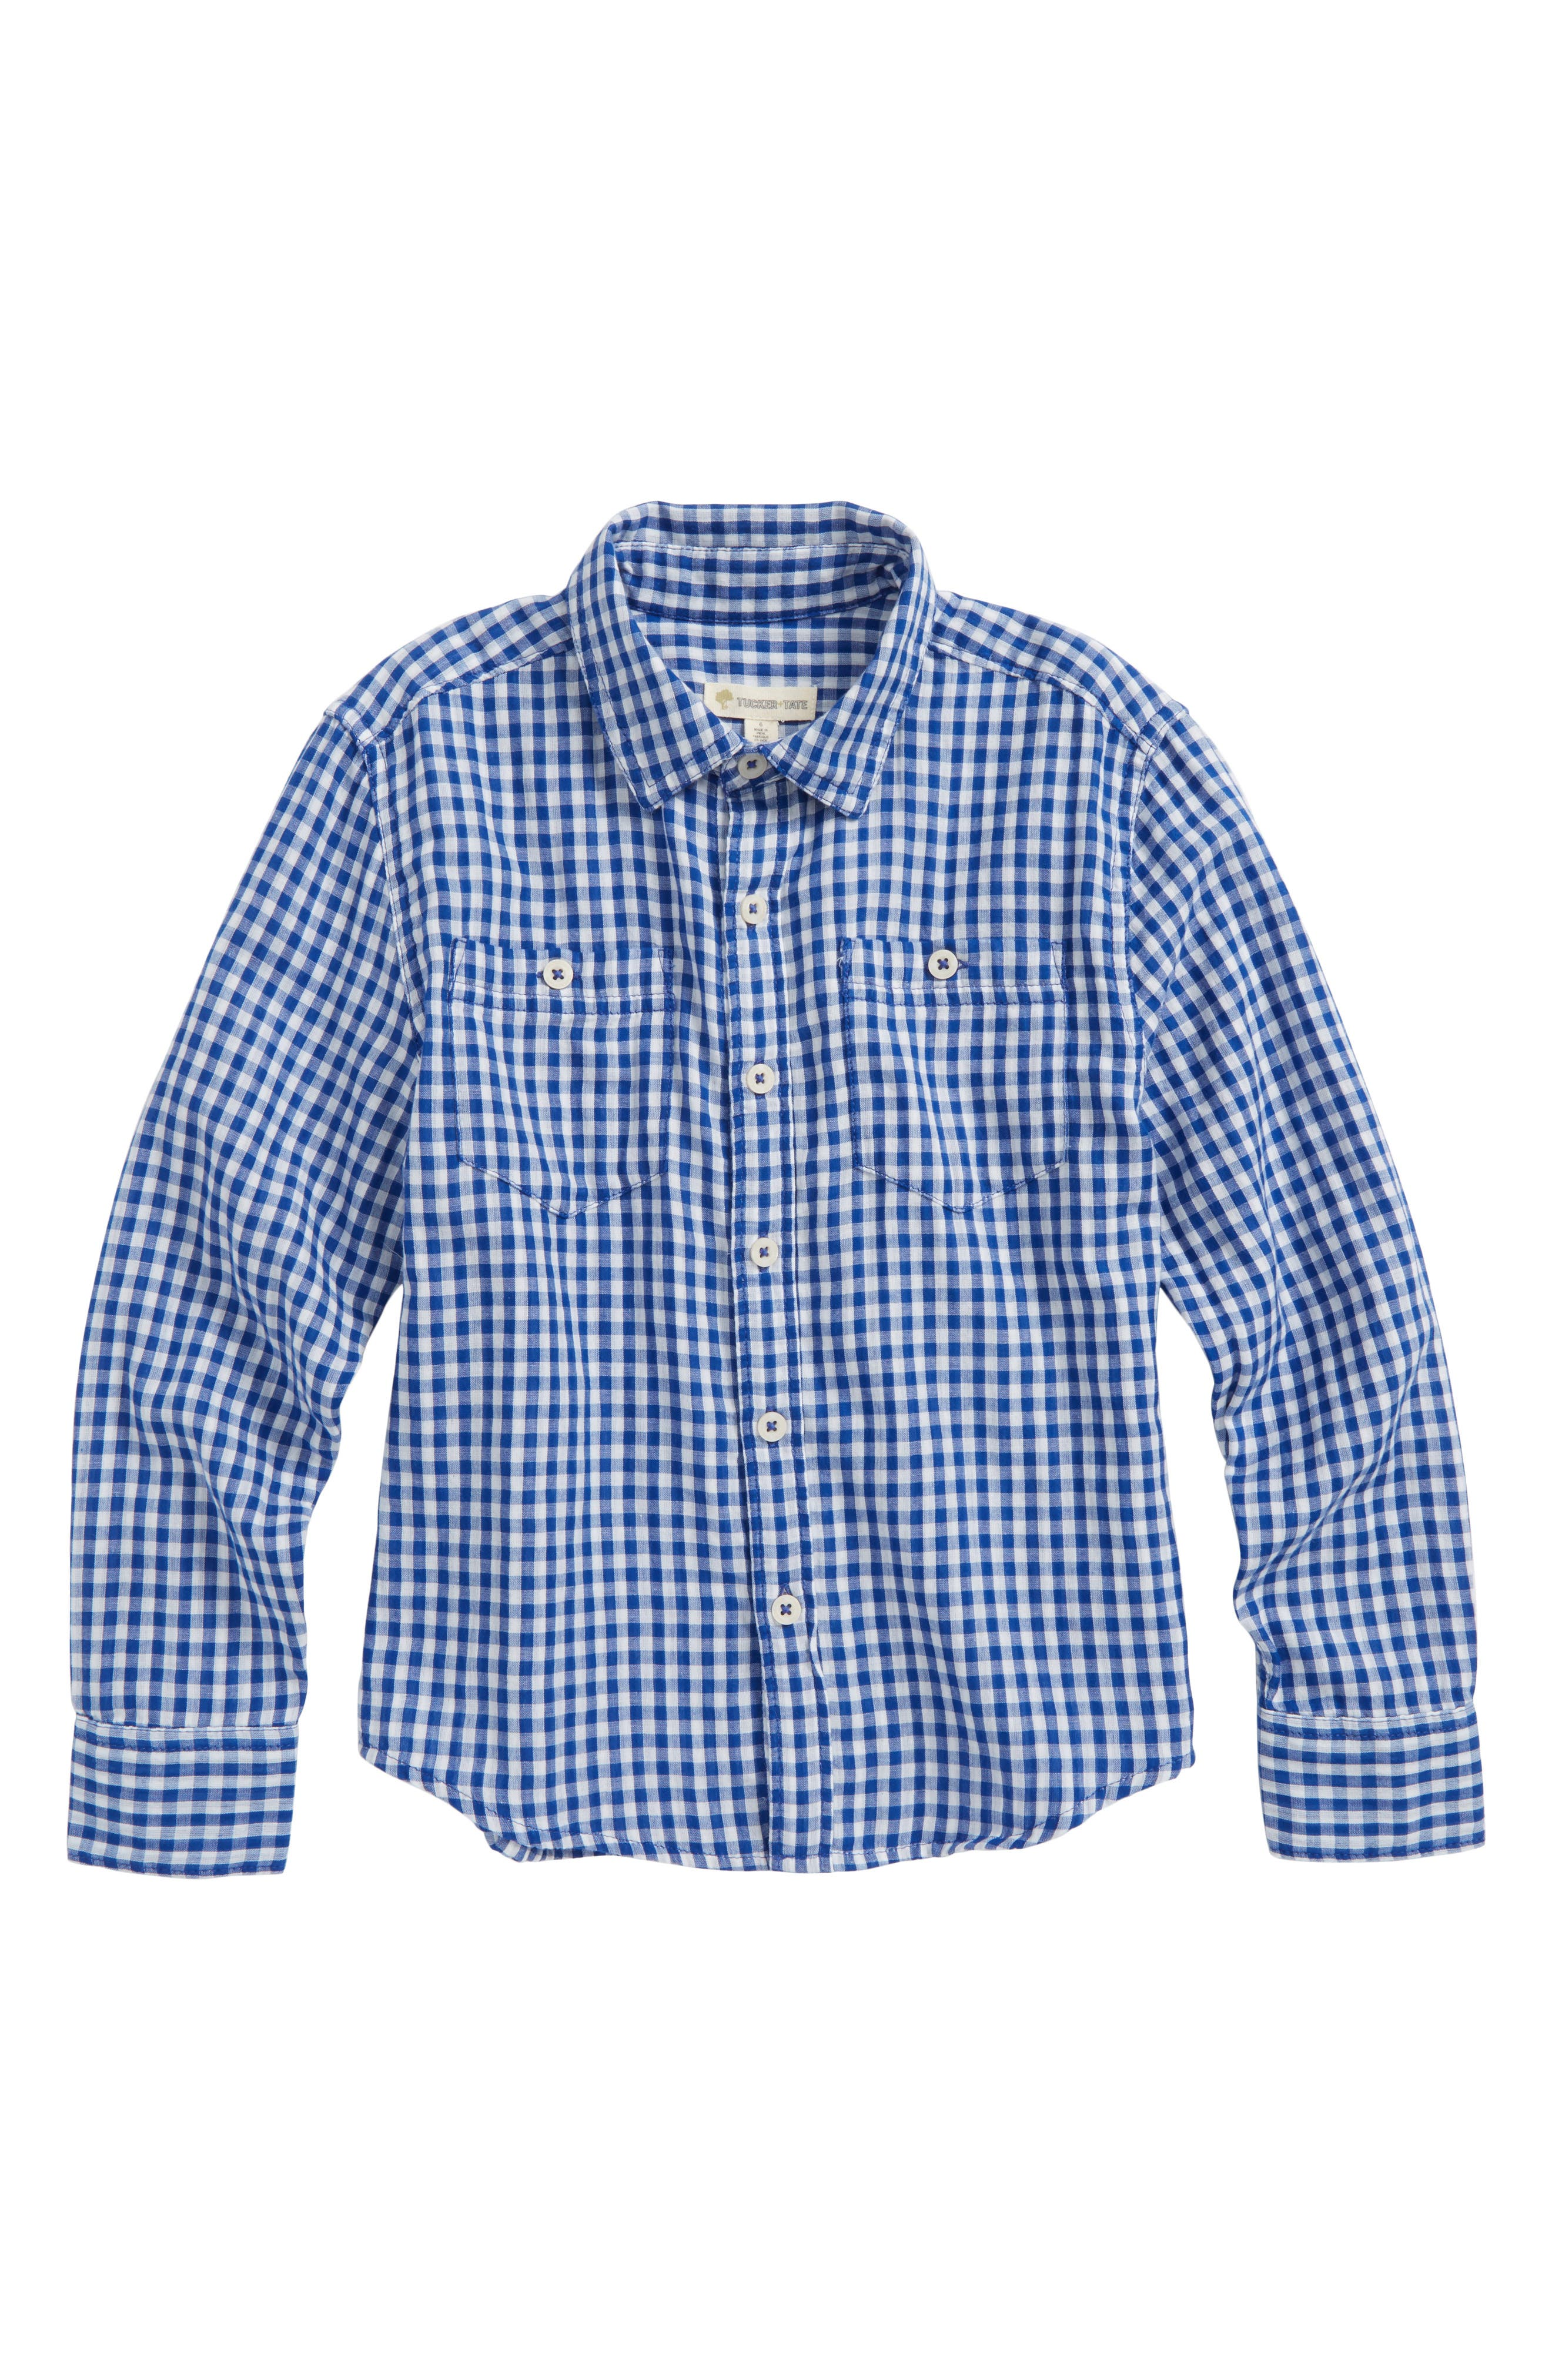 Alternate Image 1 Selected - Tucker + Tate Double Cloth Shirt (Toddler Boys & Little Boys)